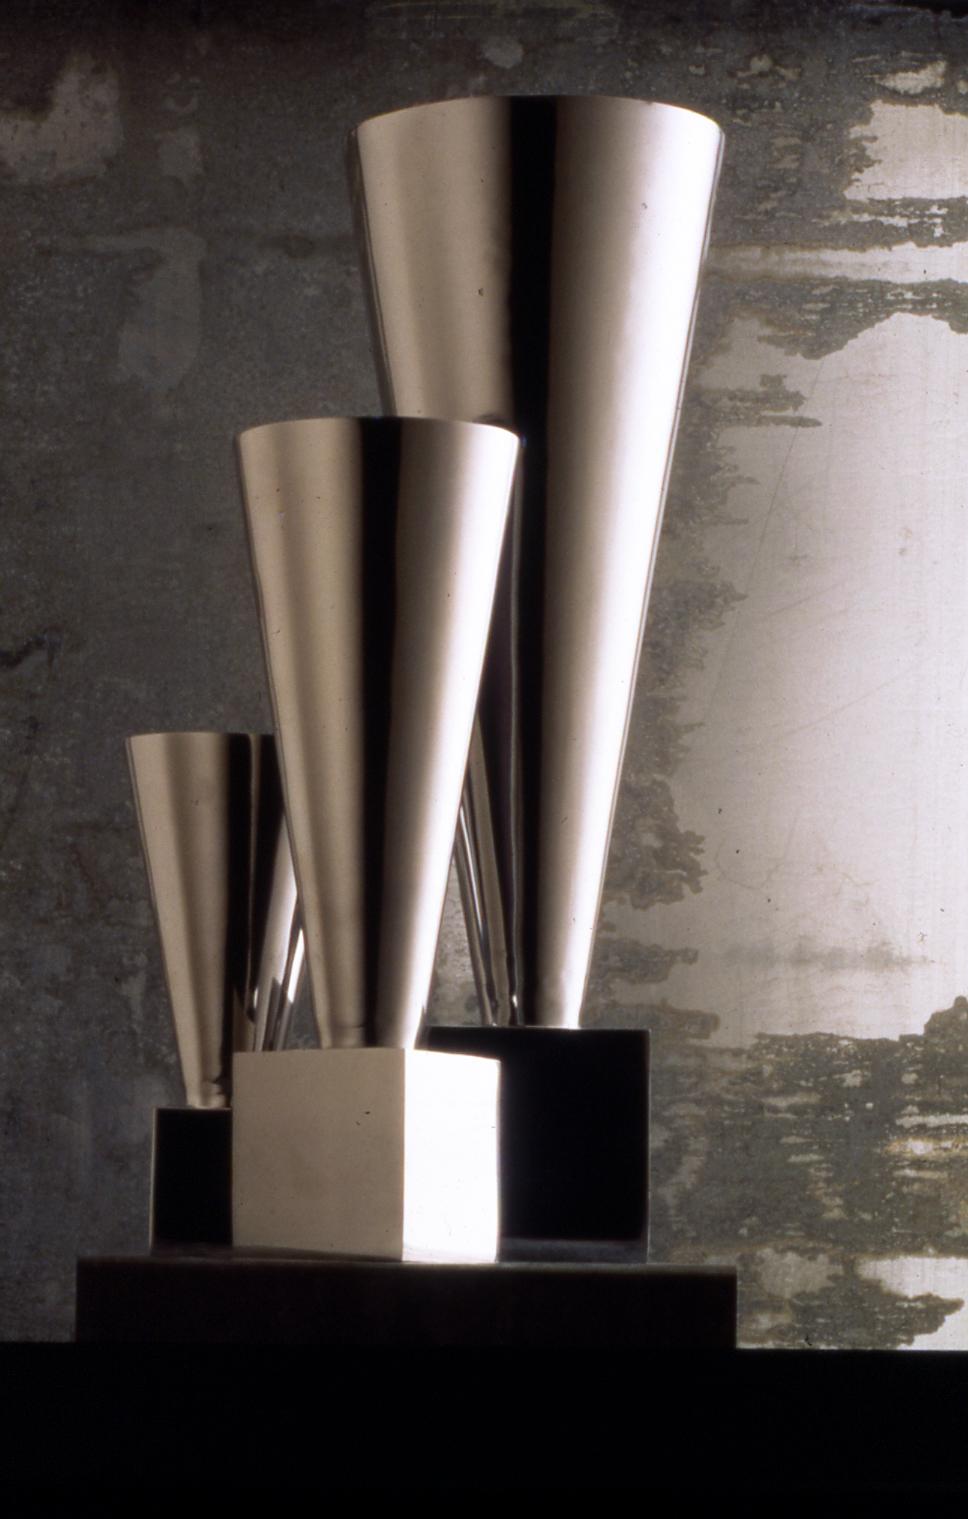 S.E.A.-Studio-Environmental-Architecture-David-Hertz-FAIA-Product-Design-California-sustainable-regenerative-restorative-green-industrial-furniture-interior-decor-syndecrete-concrete-wood-form-furnishing-modern-contemporary-7.jpg